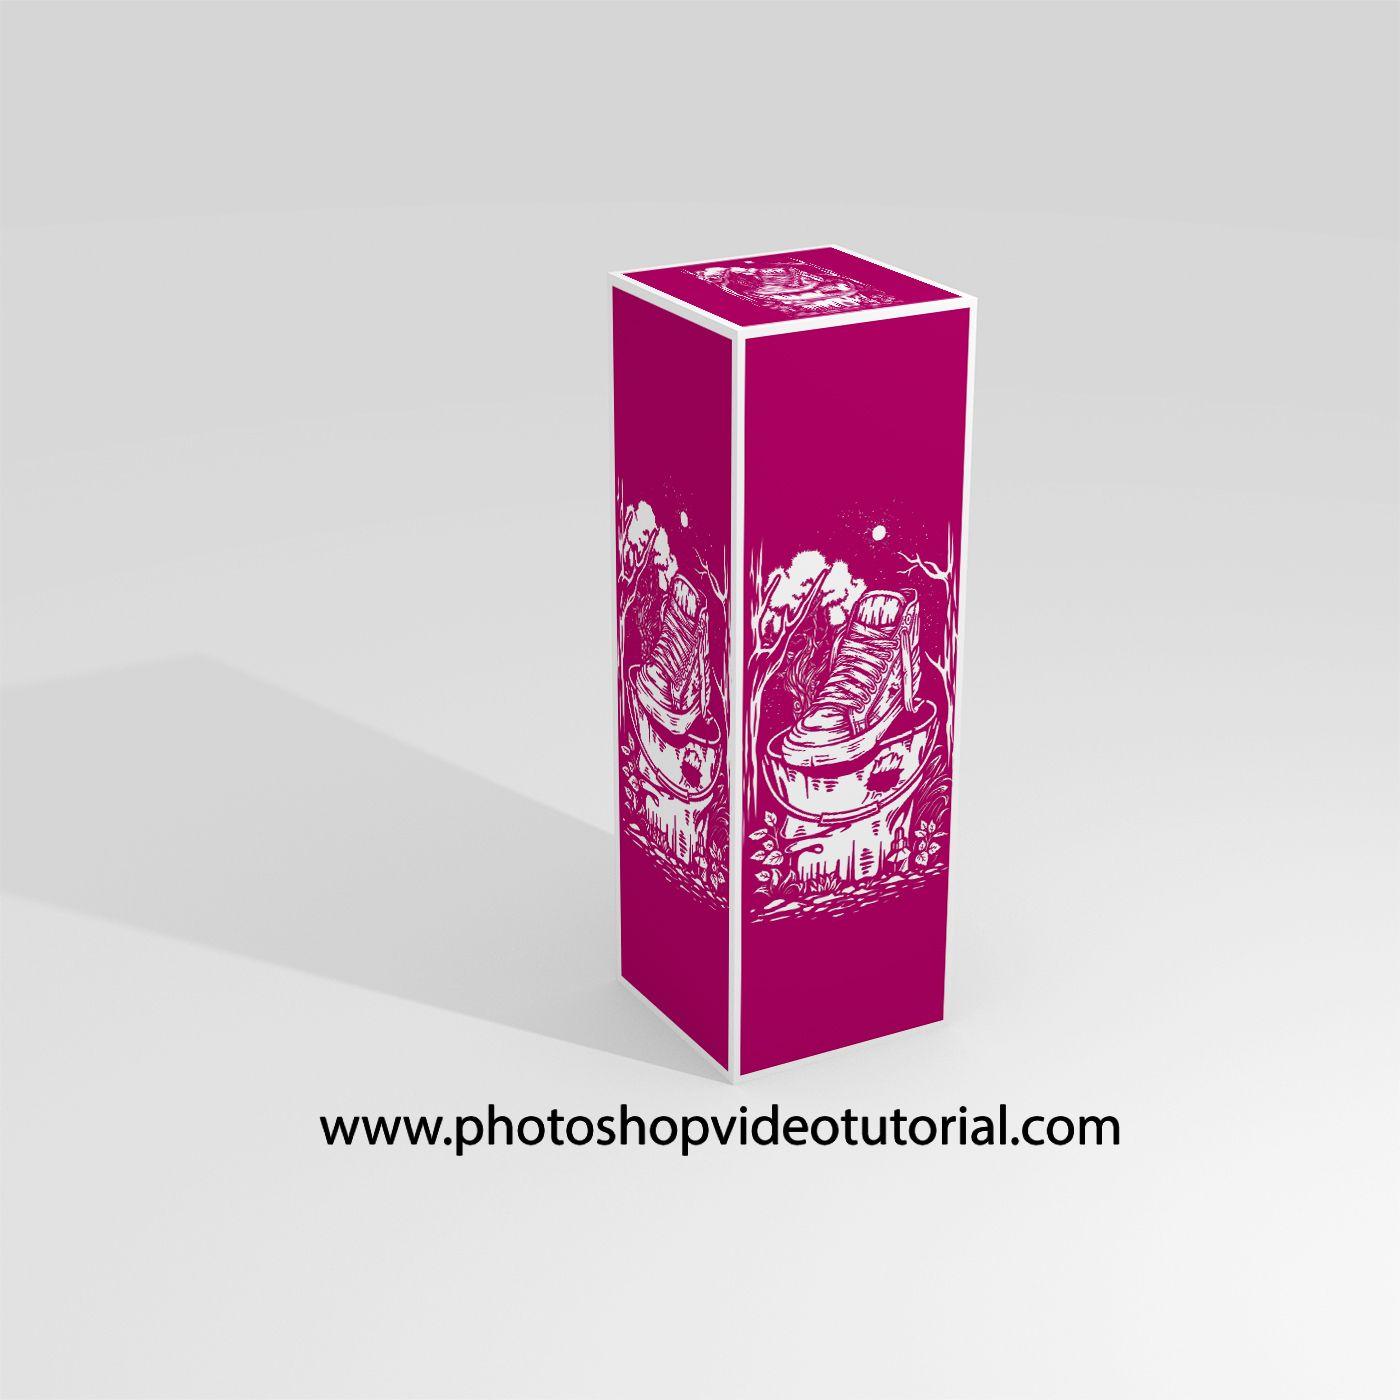 Download Best Box Label Mockup Psd Branding Download Downloadpsd Free Freemockup Freepsd Freebie Labelmockup Free Logo Mockup Logo Design Mockup Free Logo Psd